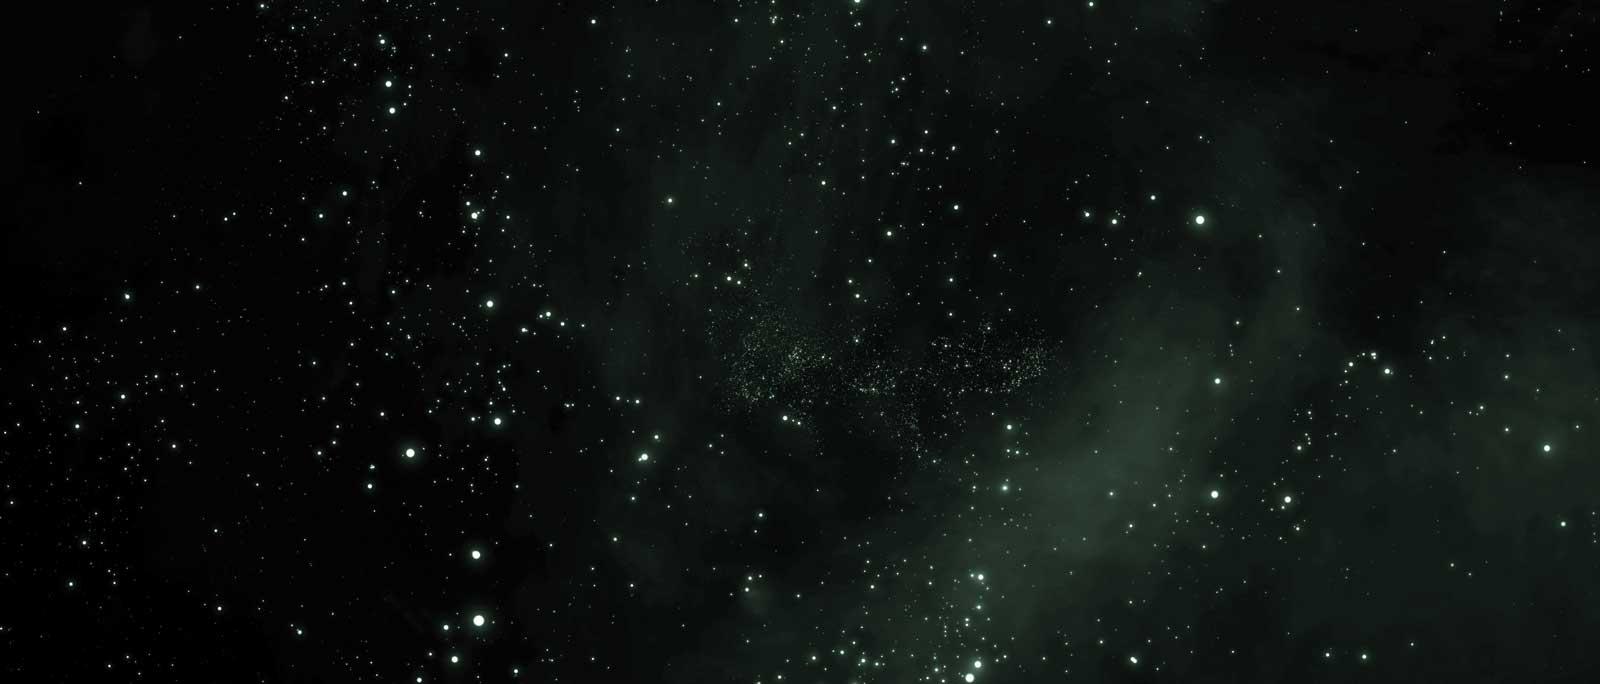 sfondo spaziale fainplast